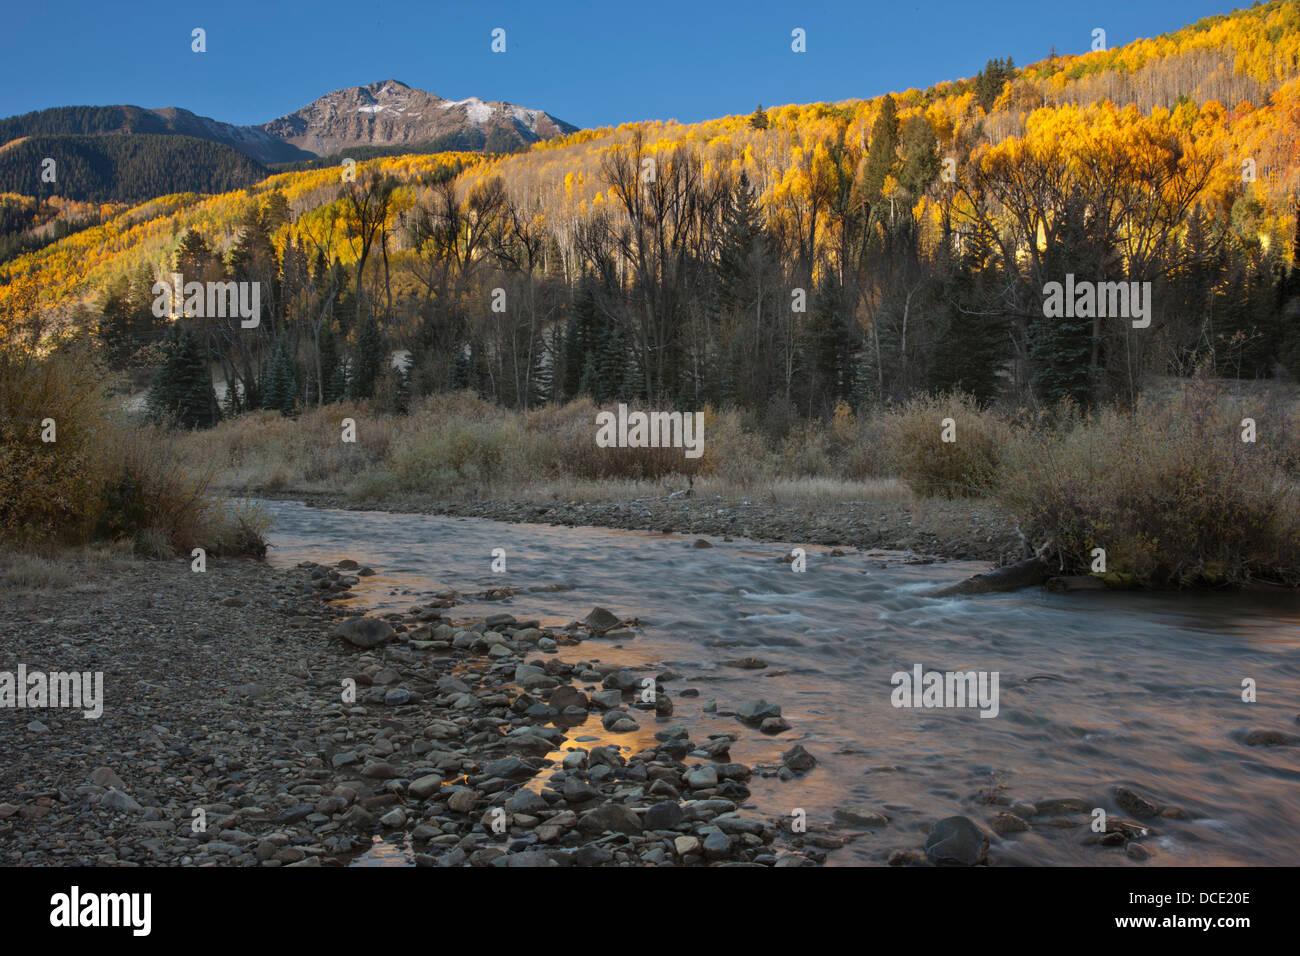 USA, Colorado, San Juan Mountains. Sunshine Mountain looms above San Miguel River. - Stock Image